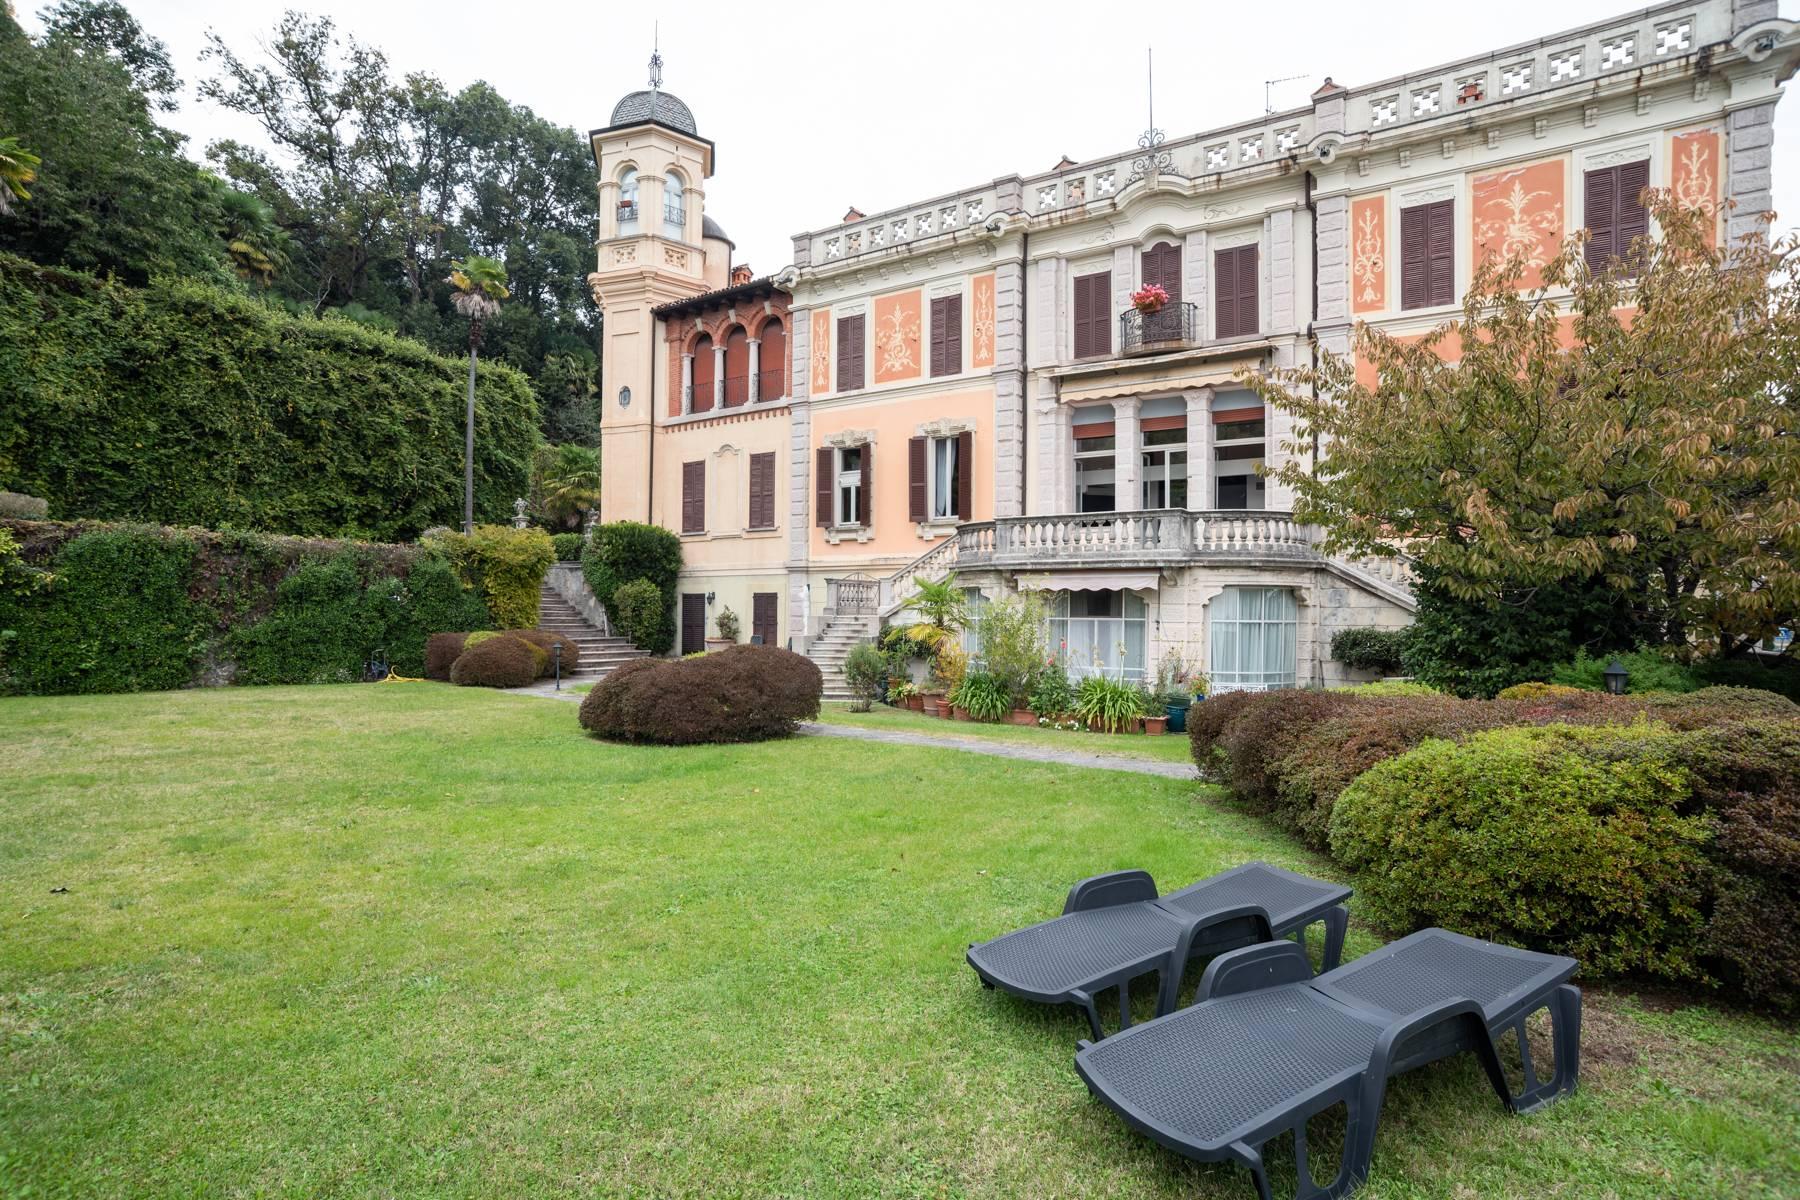 Appartamento in Vendita a Belgirate: 4 locali, 118 mq - Foto 7